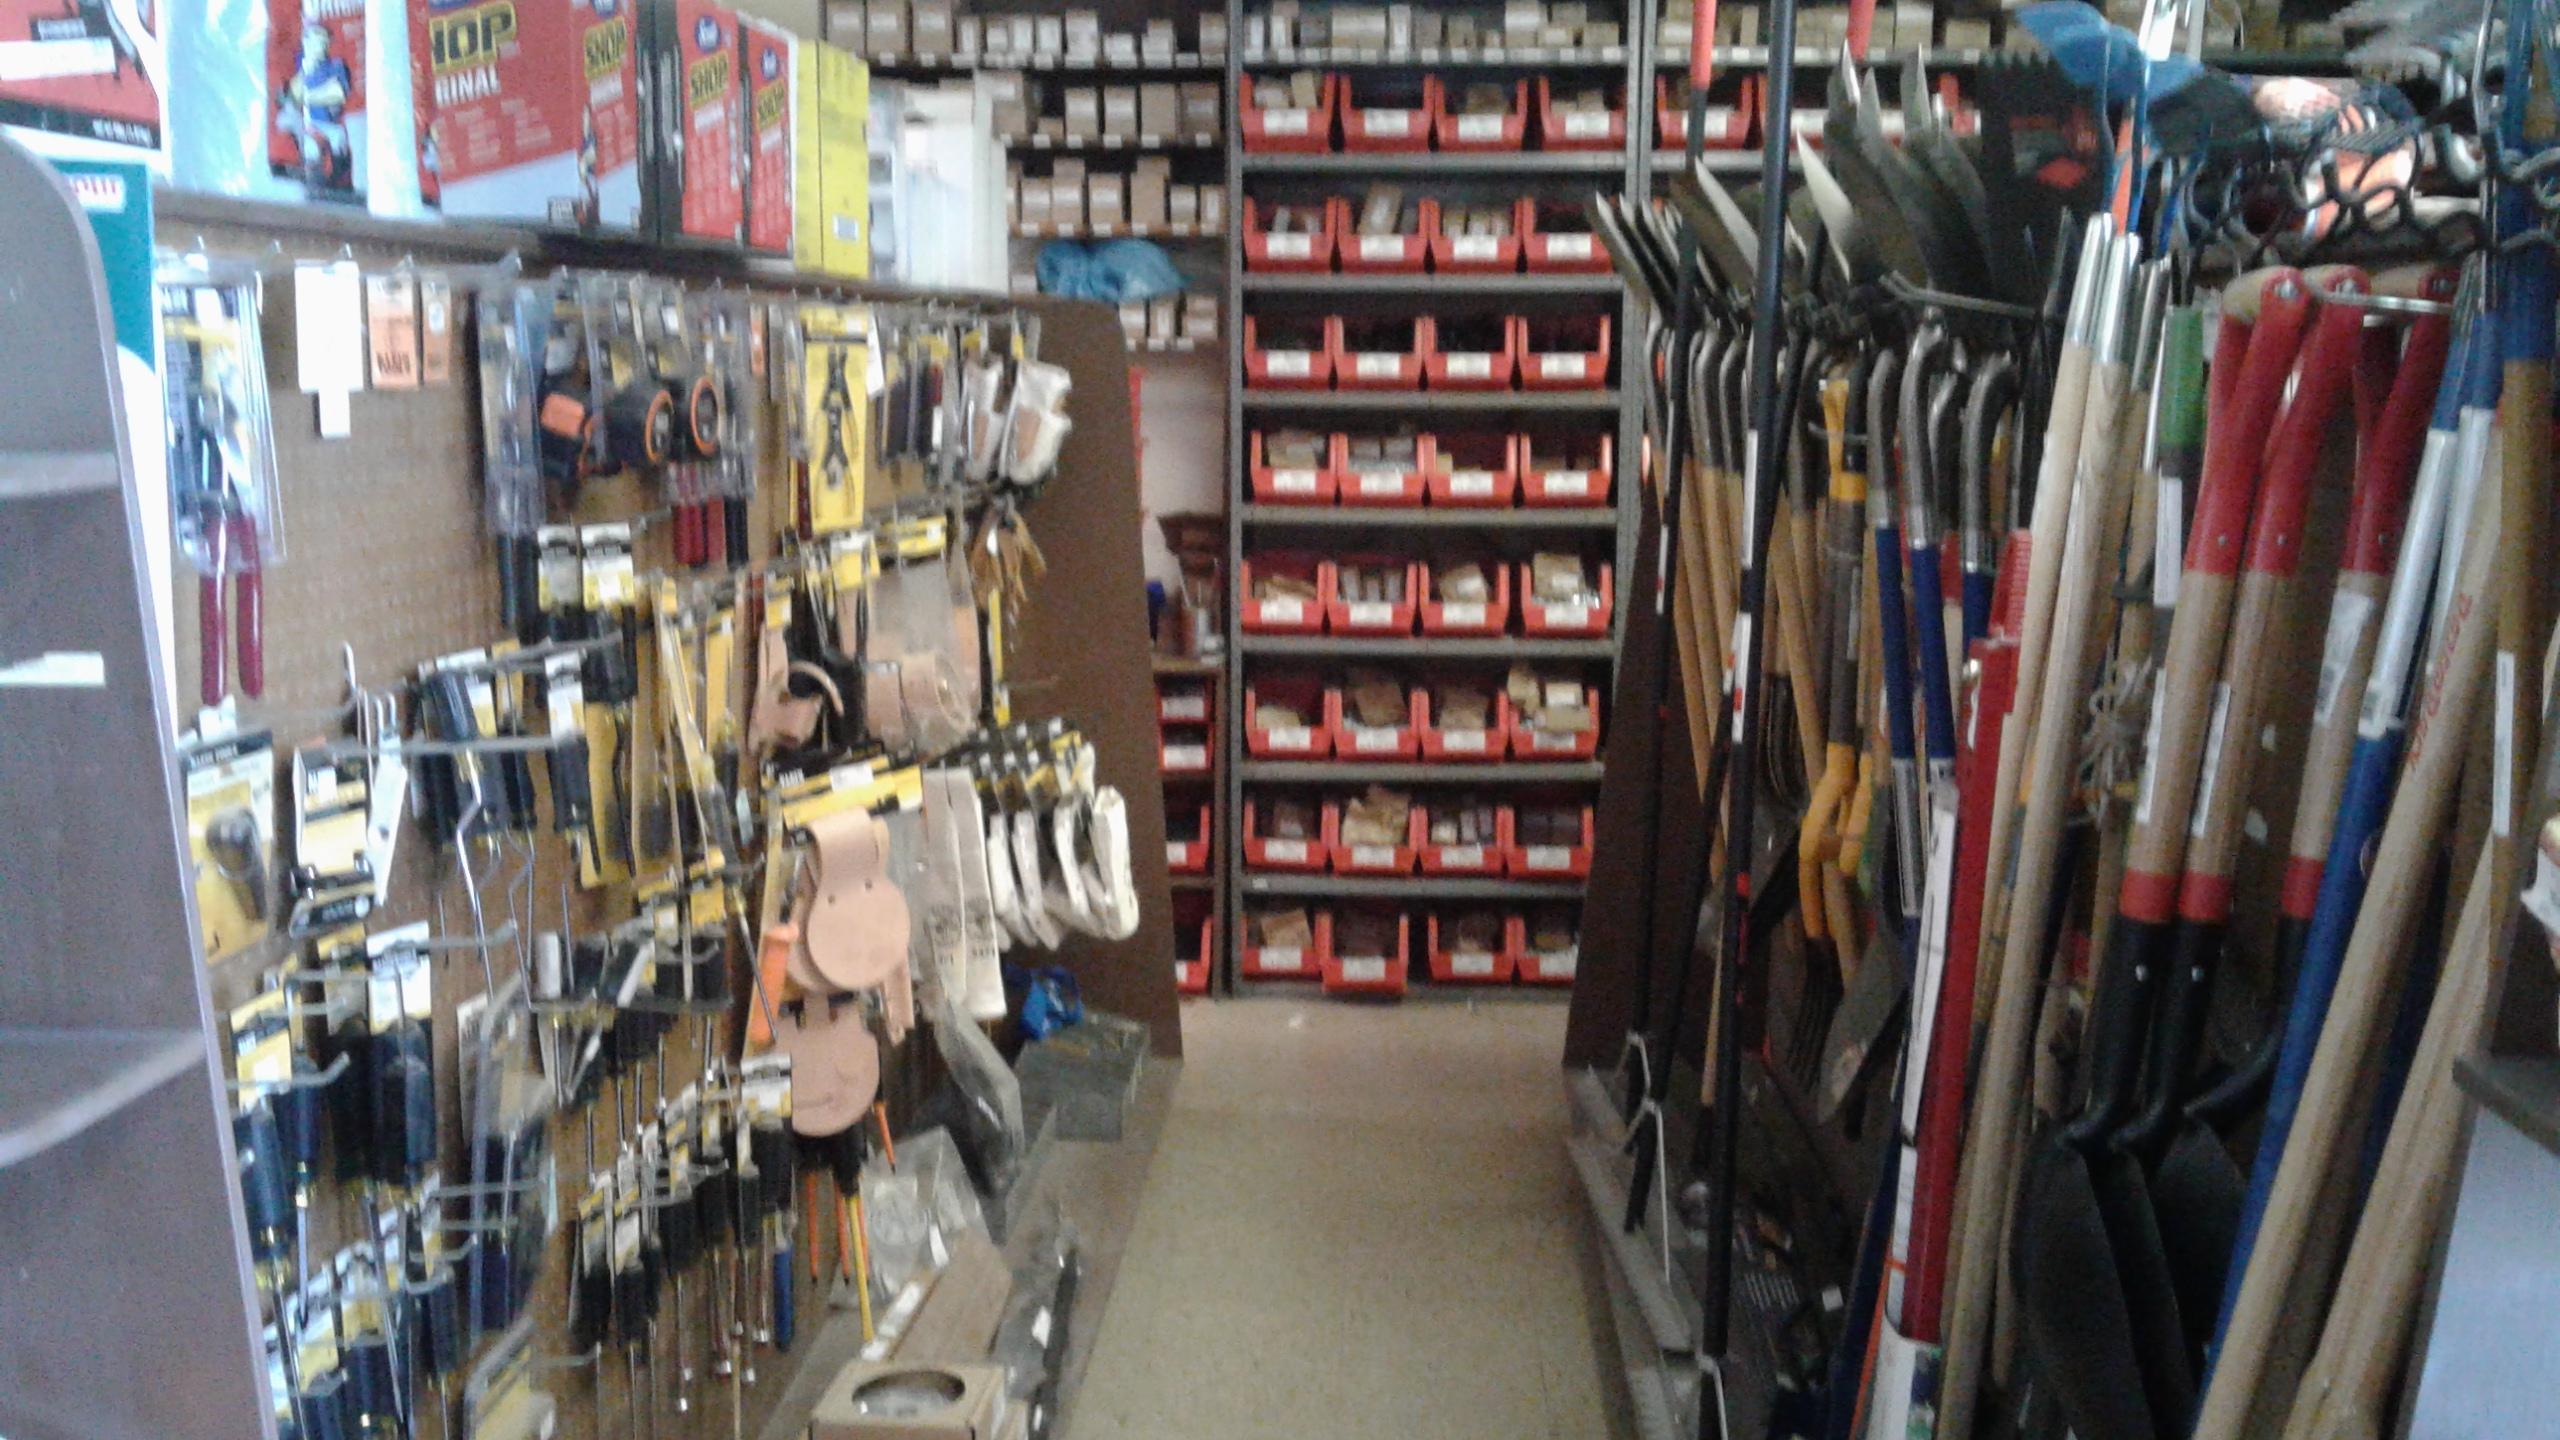 Comal Supply & Hardware Store image 1